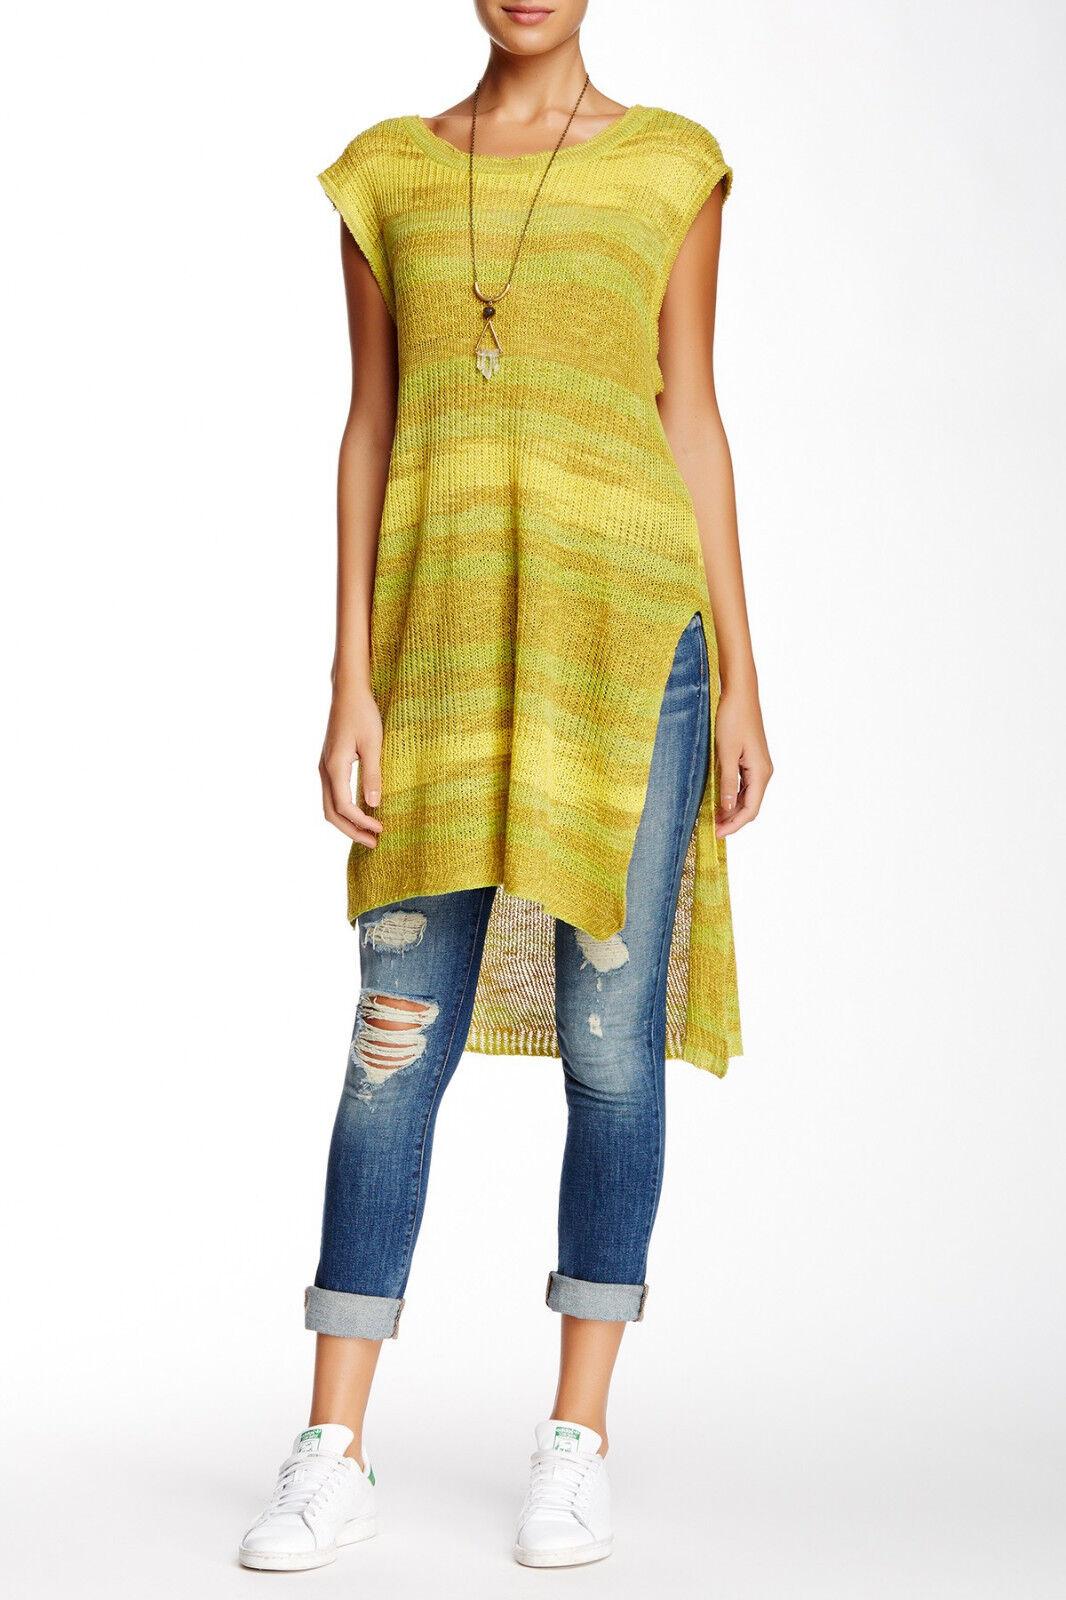 NWT  Free People Sunny Days Sweater Lemon Combo [SZ S P Small]